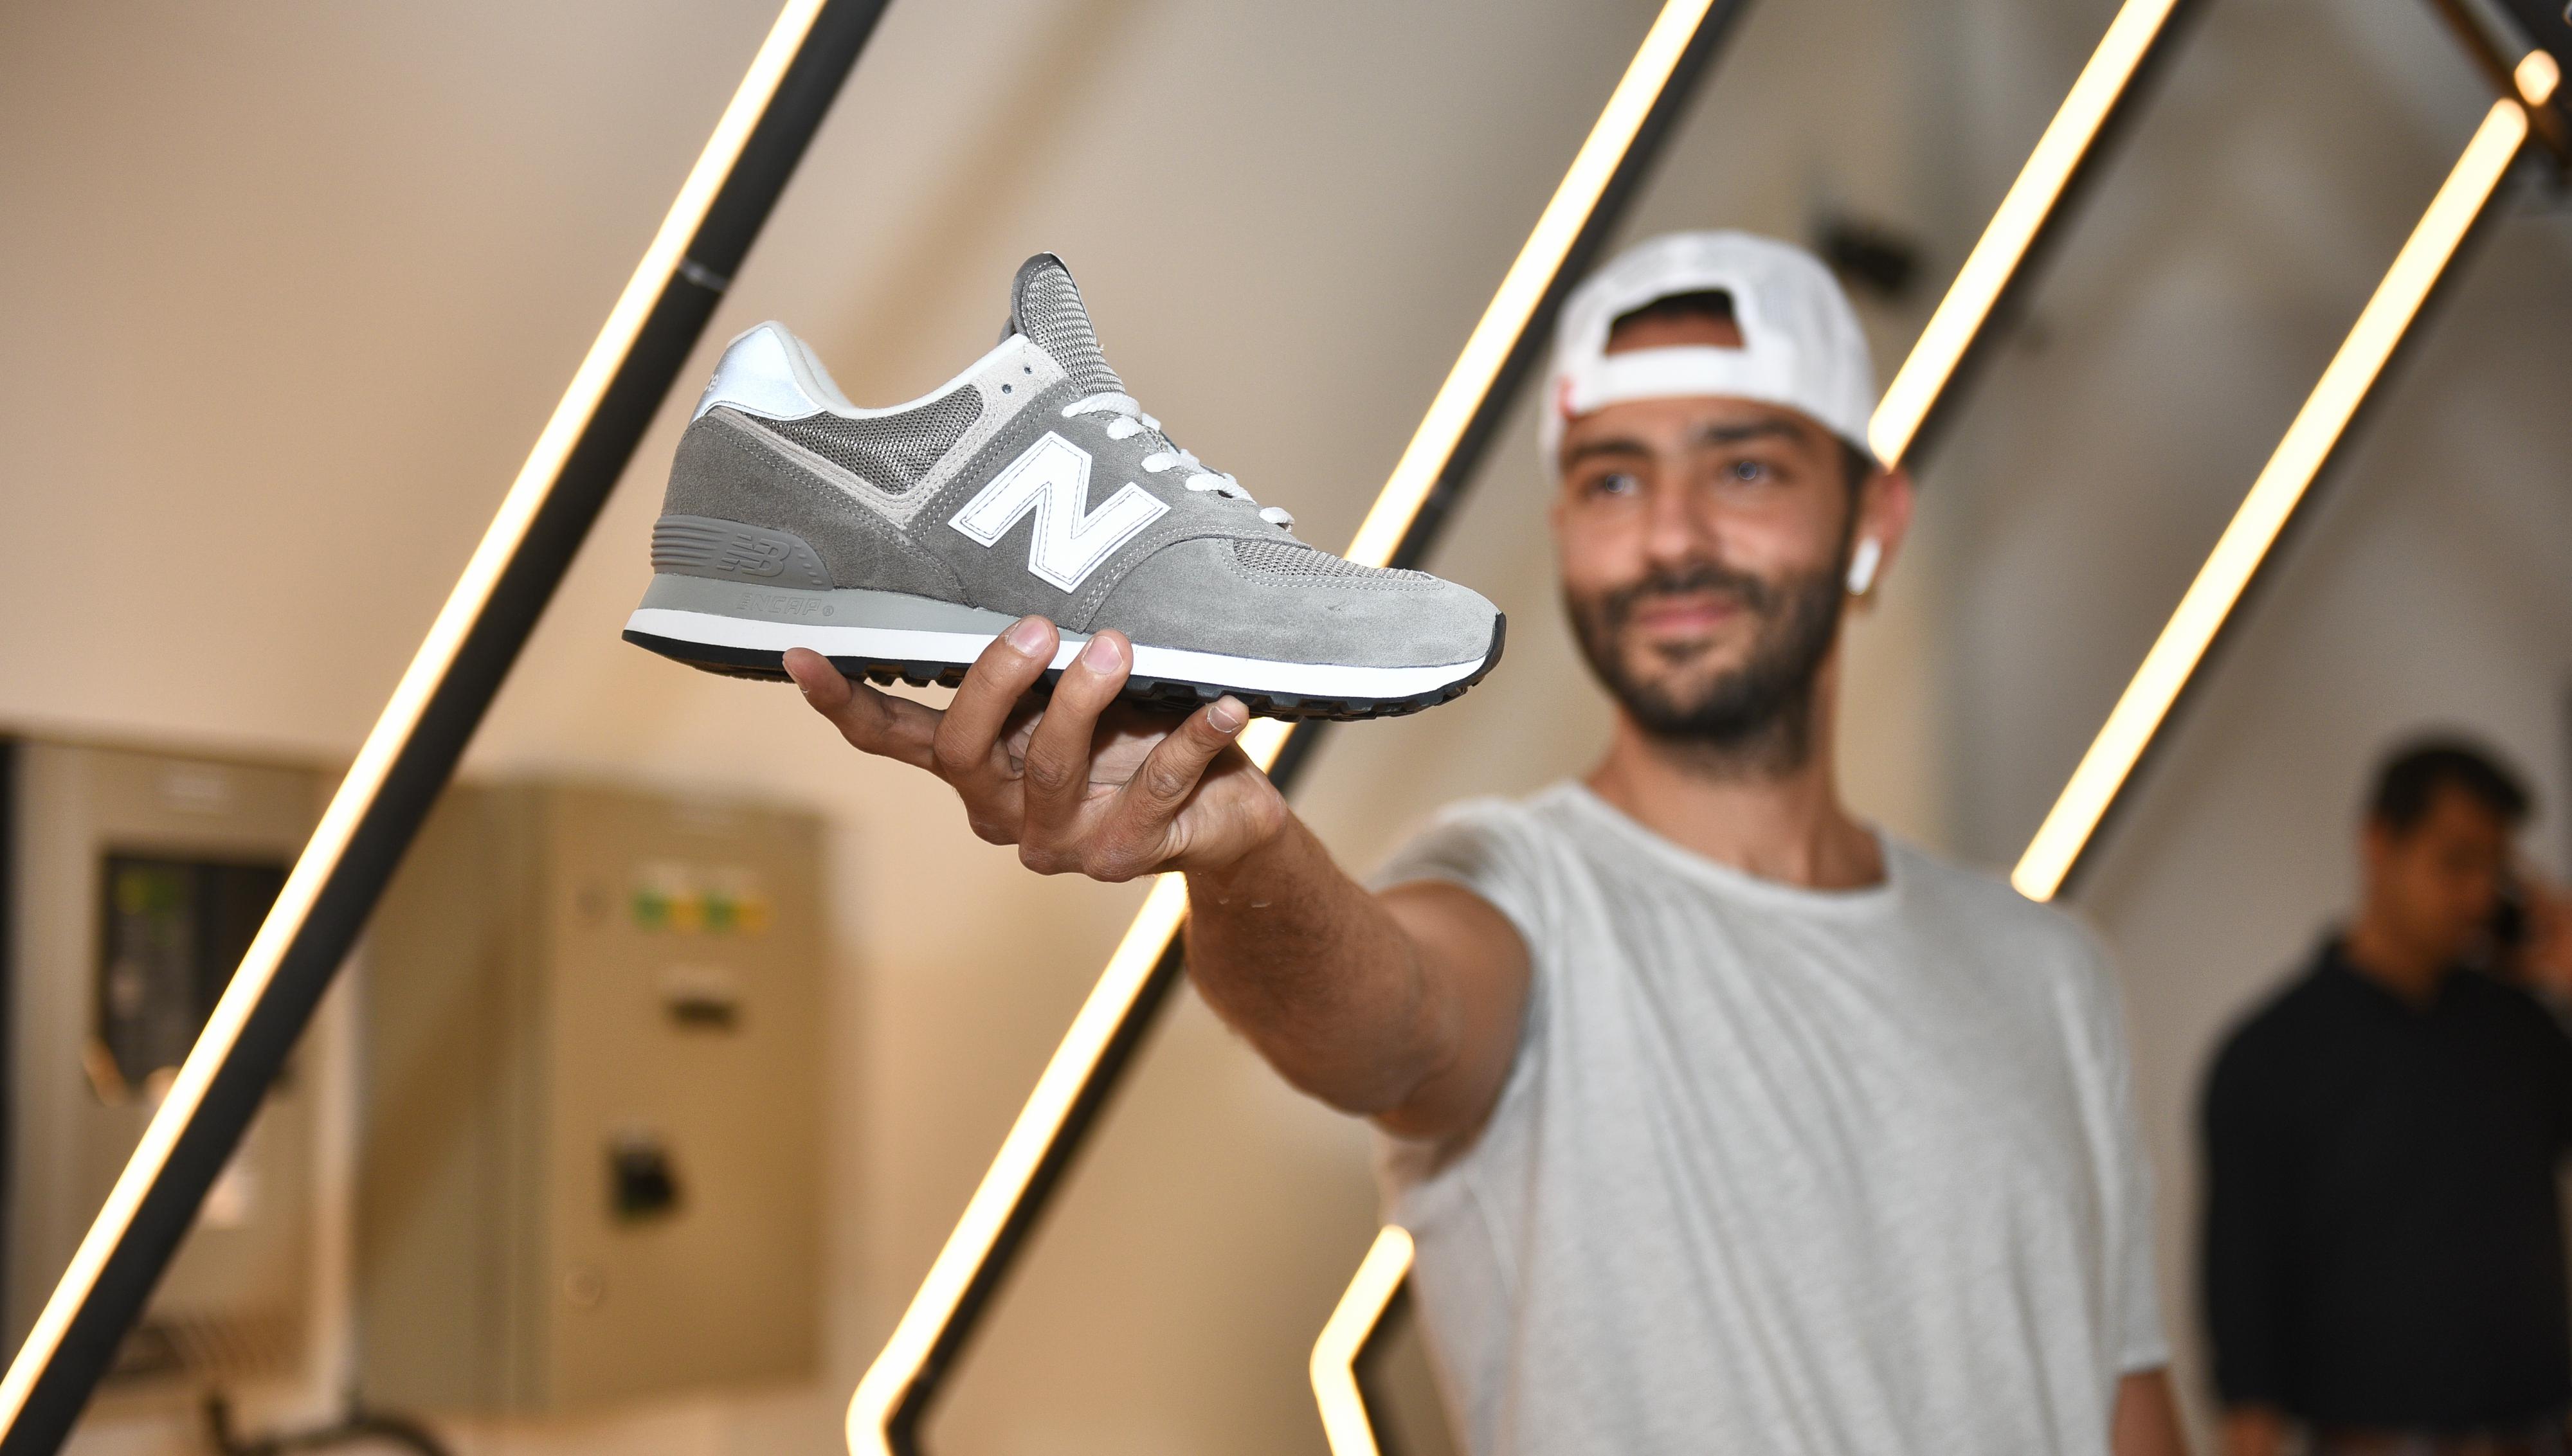 pretty nice 2b7ce 10bfc Sneaker community gathers to celebrate New Balance 'Grey Day ...